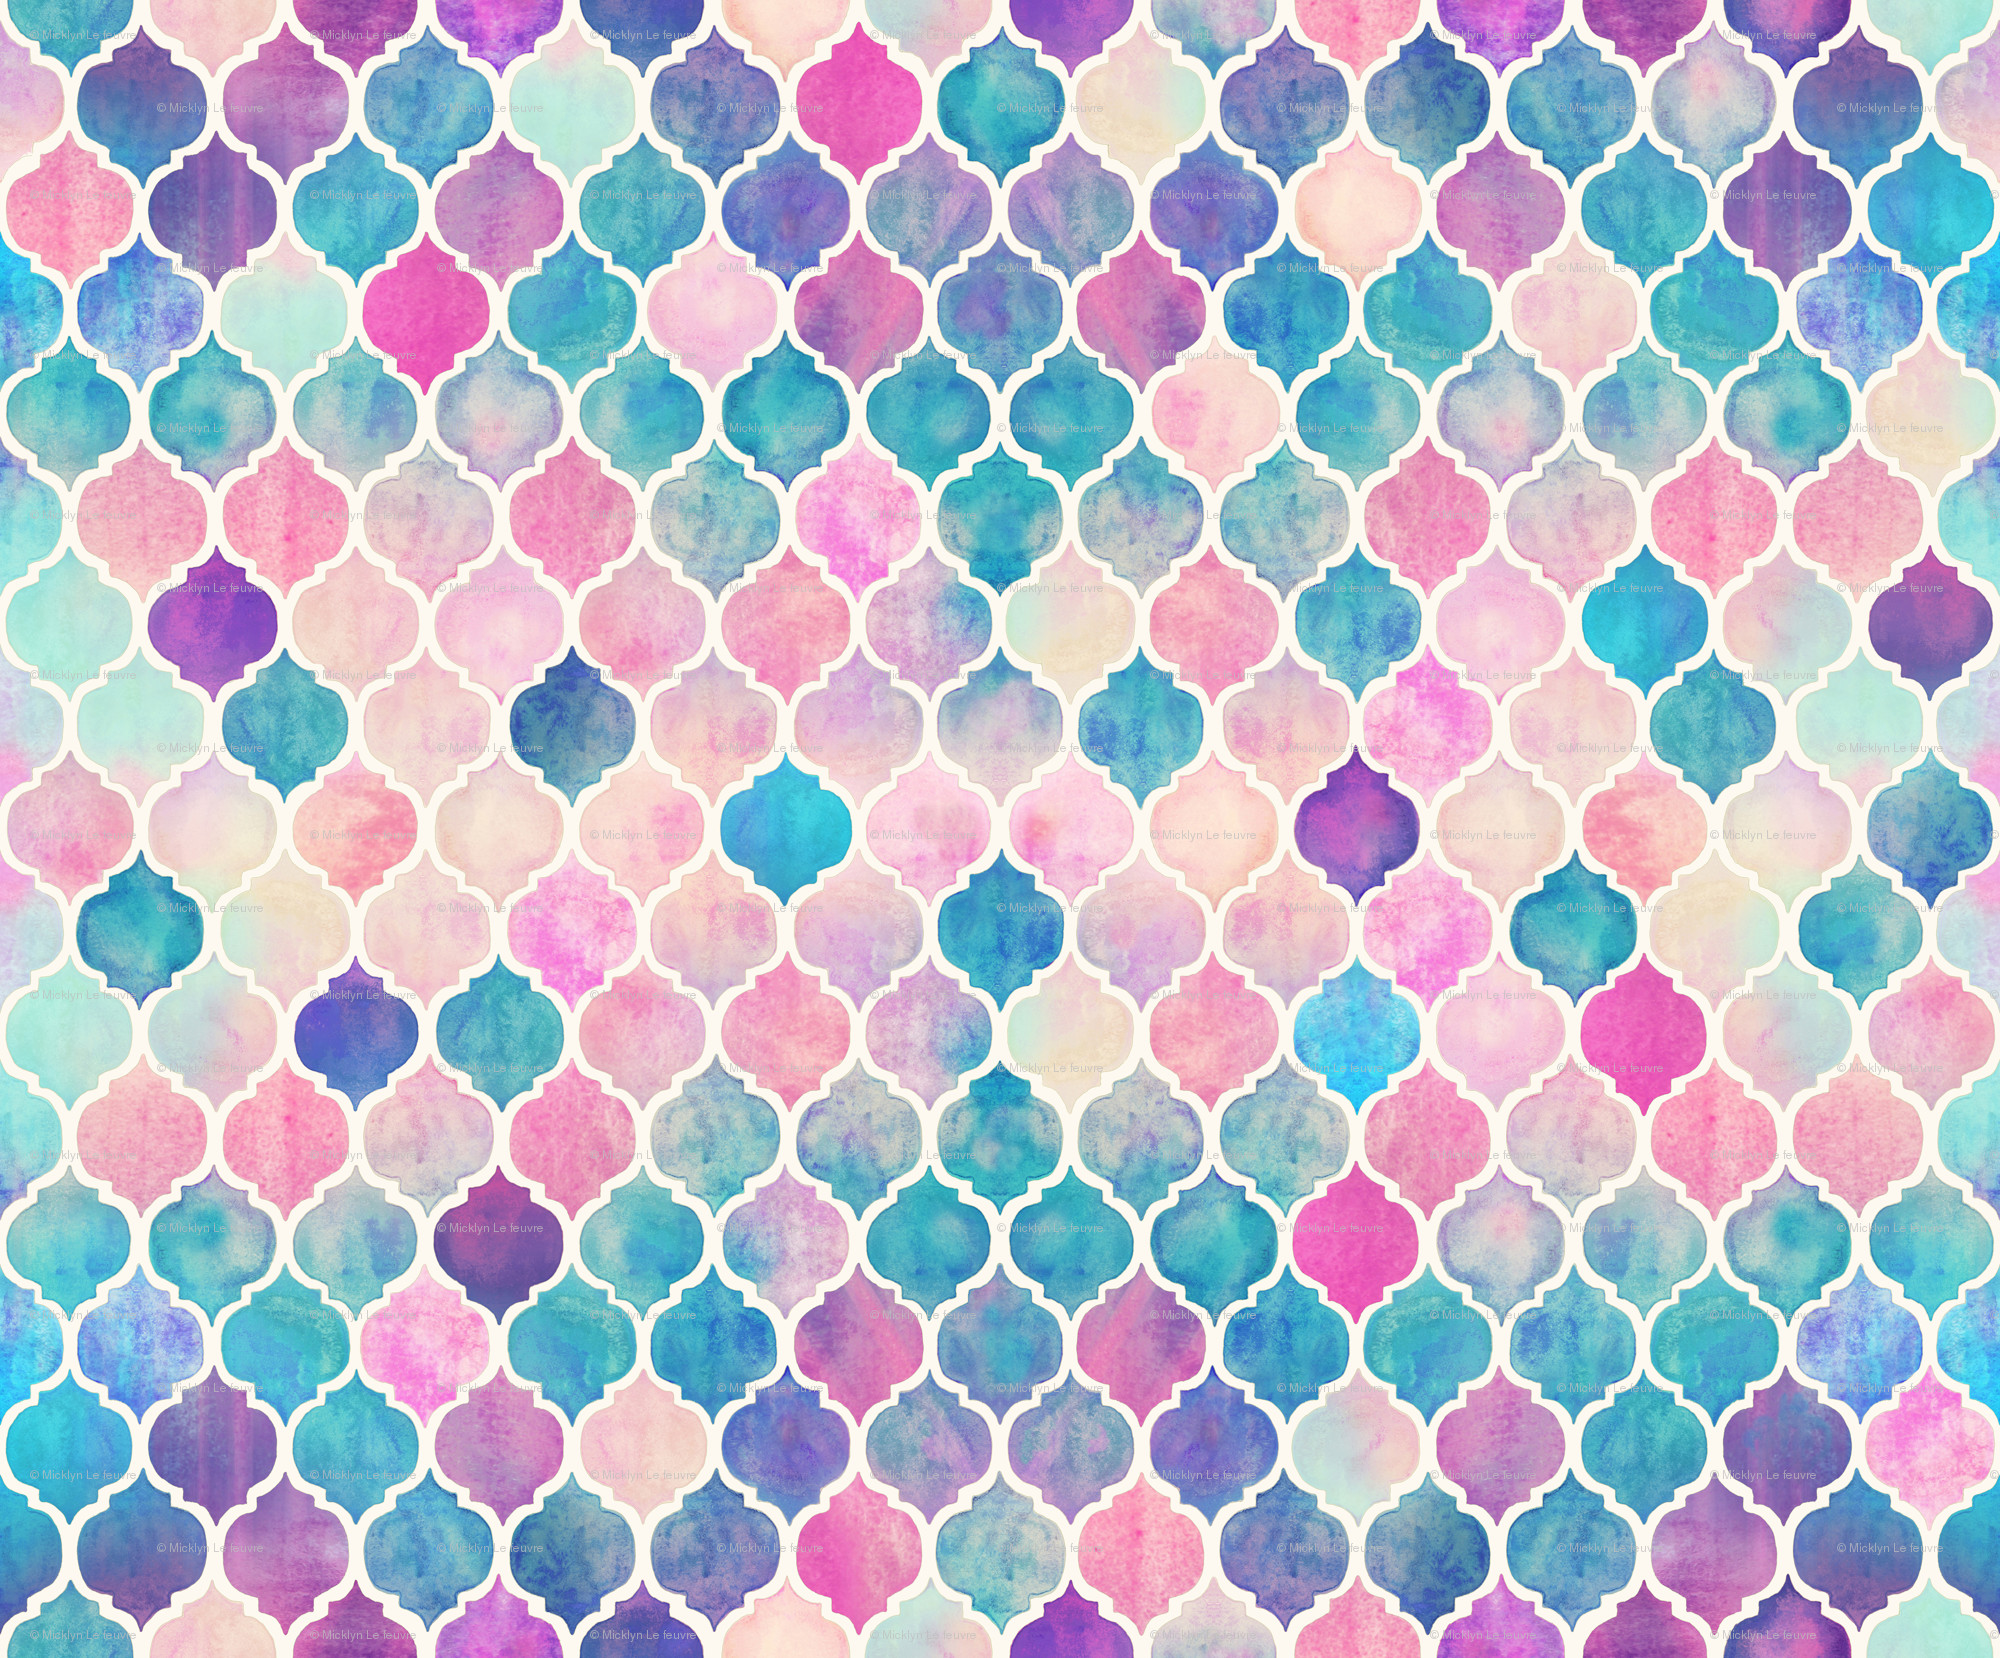 Rainbow Pastel Watercolor Moroccan Pattern wallpaper – micklyn – Spoonflower